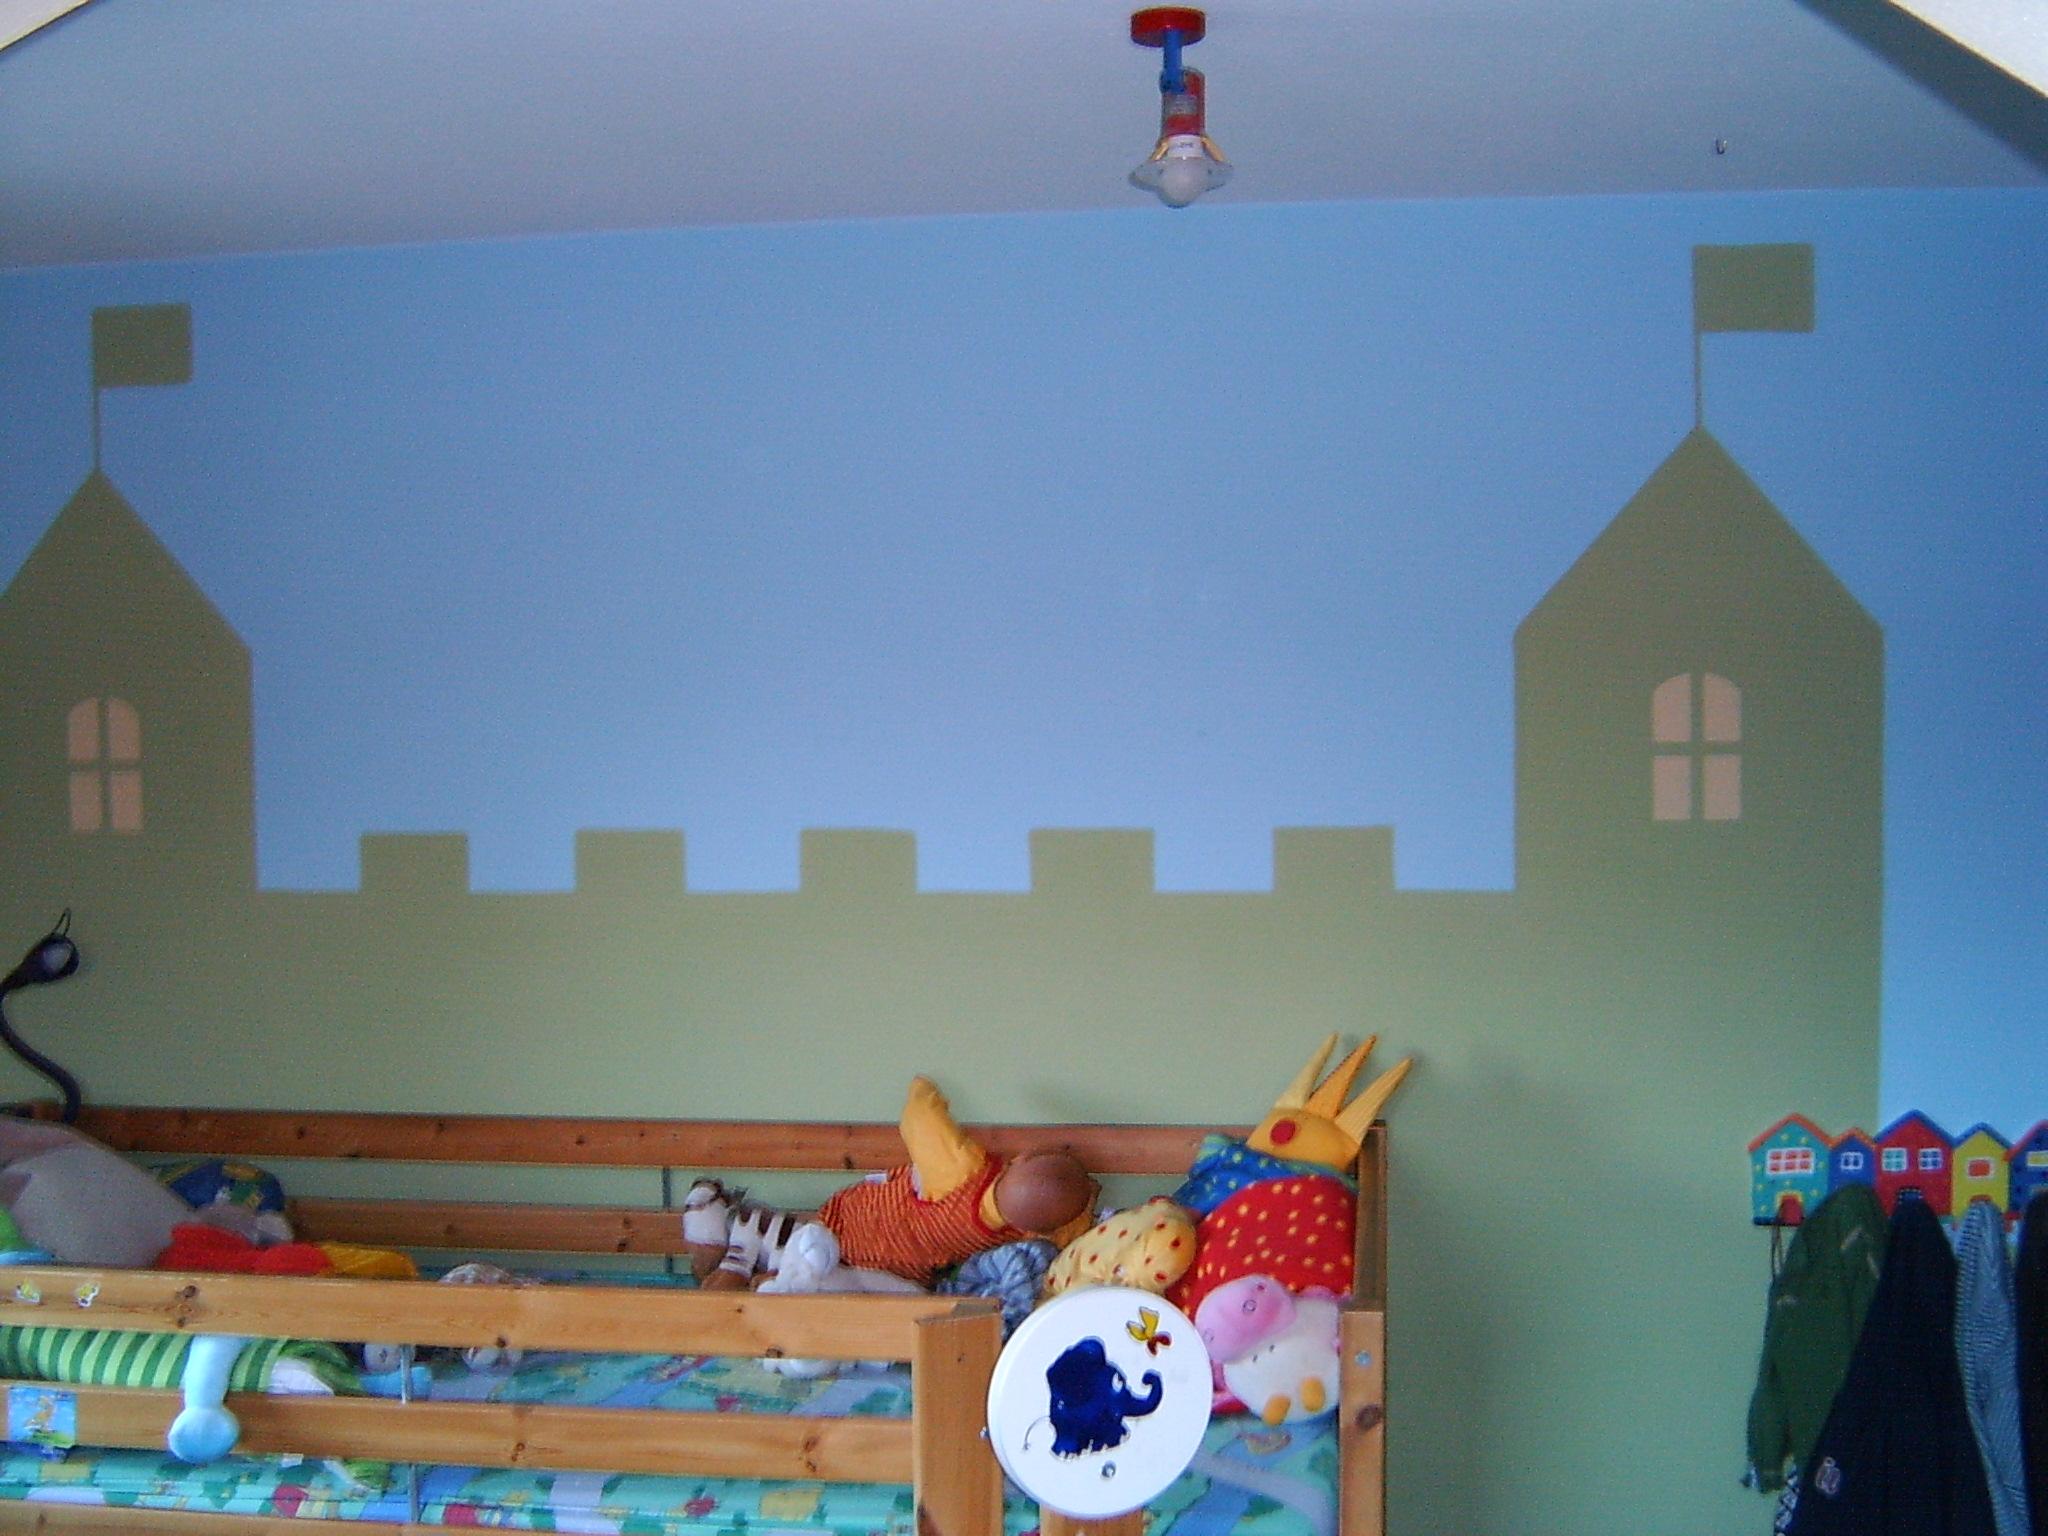 Wandgestaltung Kinderzimmer Ritterburg Ideen f?rs